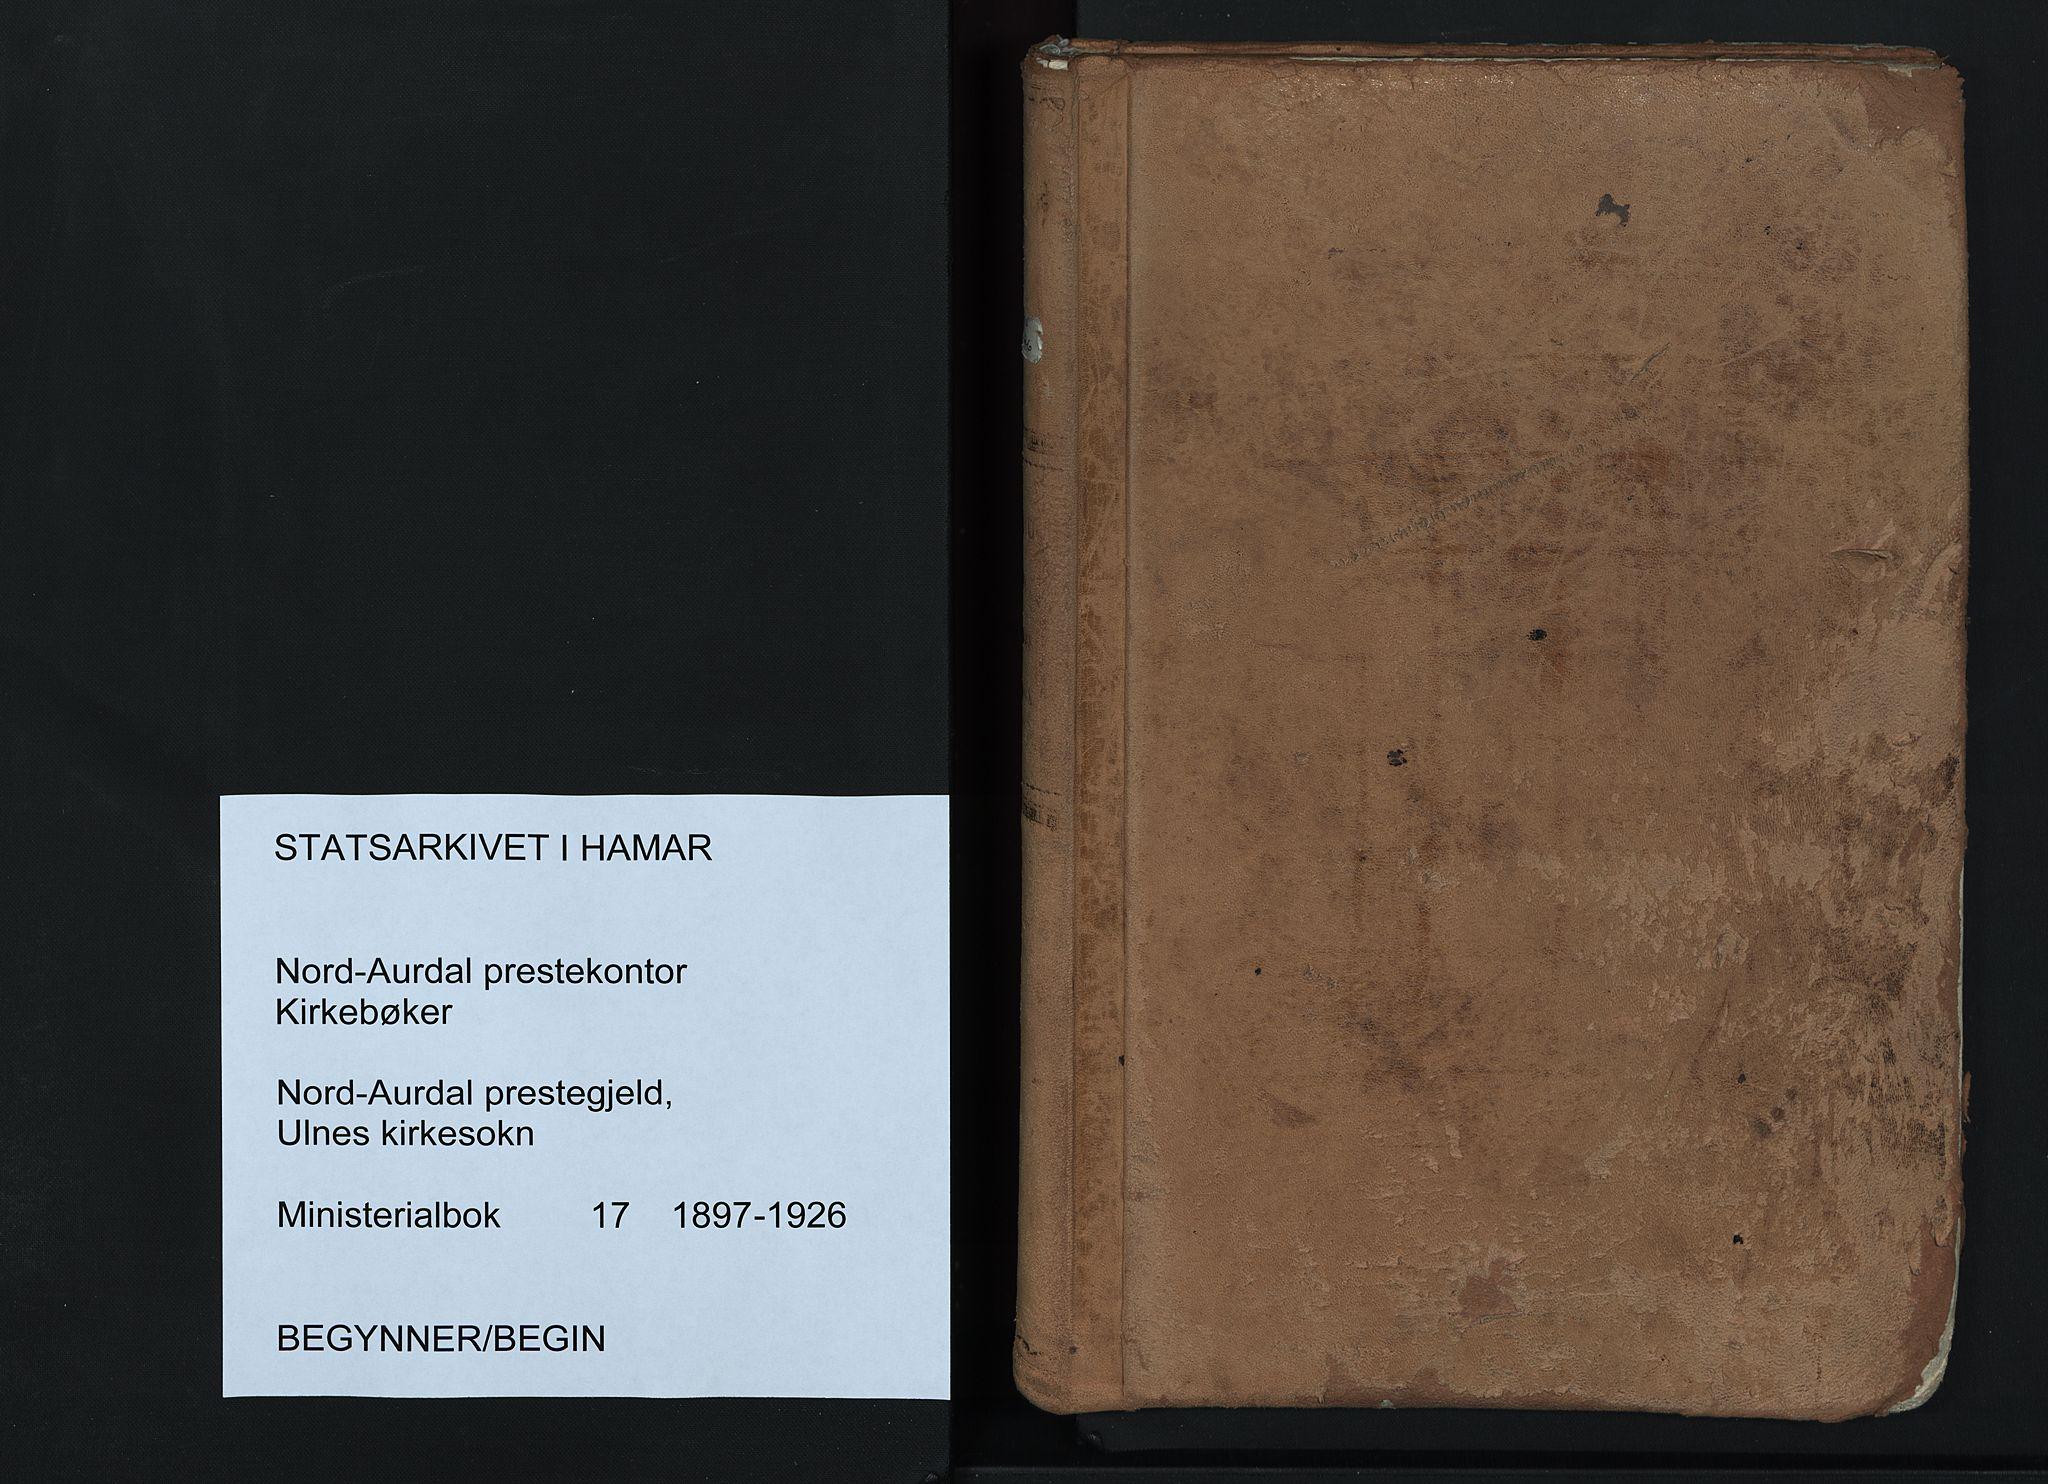 SAH, Nord-Aurdal prestekontor, Ministerialbok nr. 17, 1897-1926